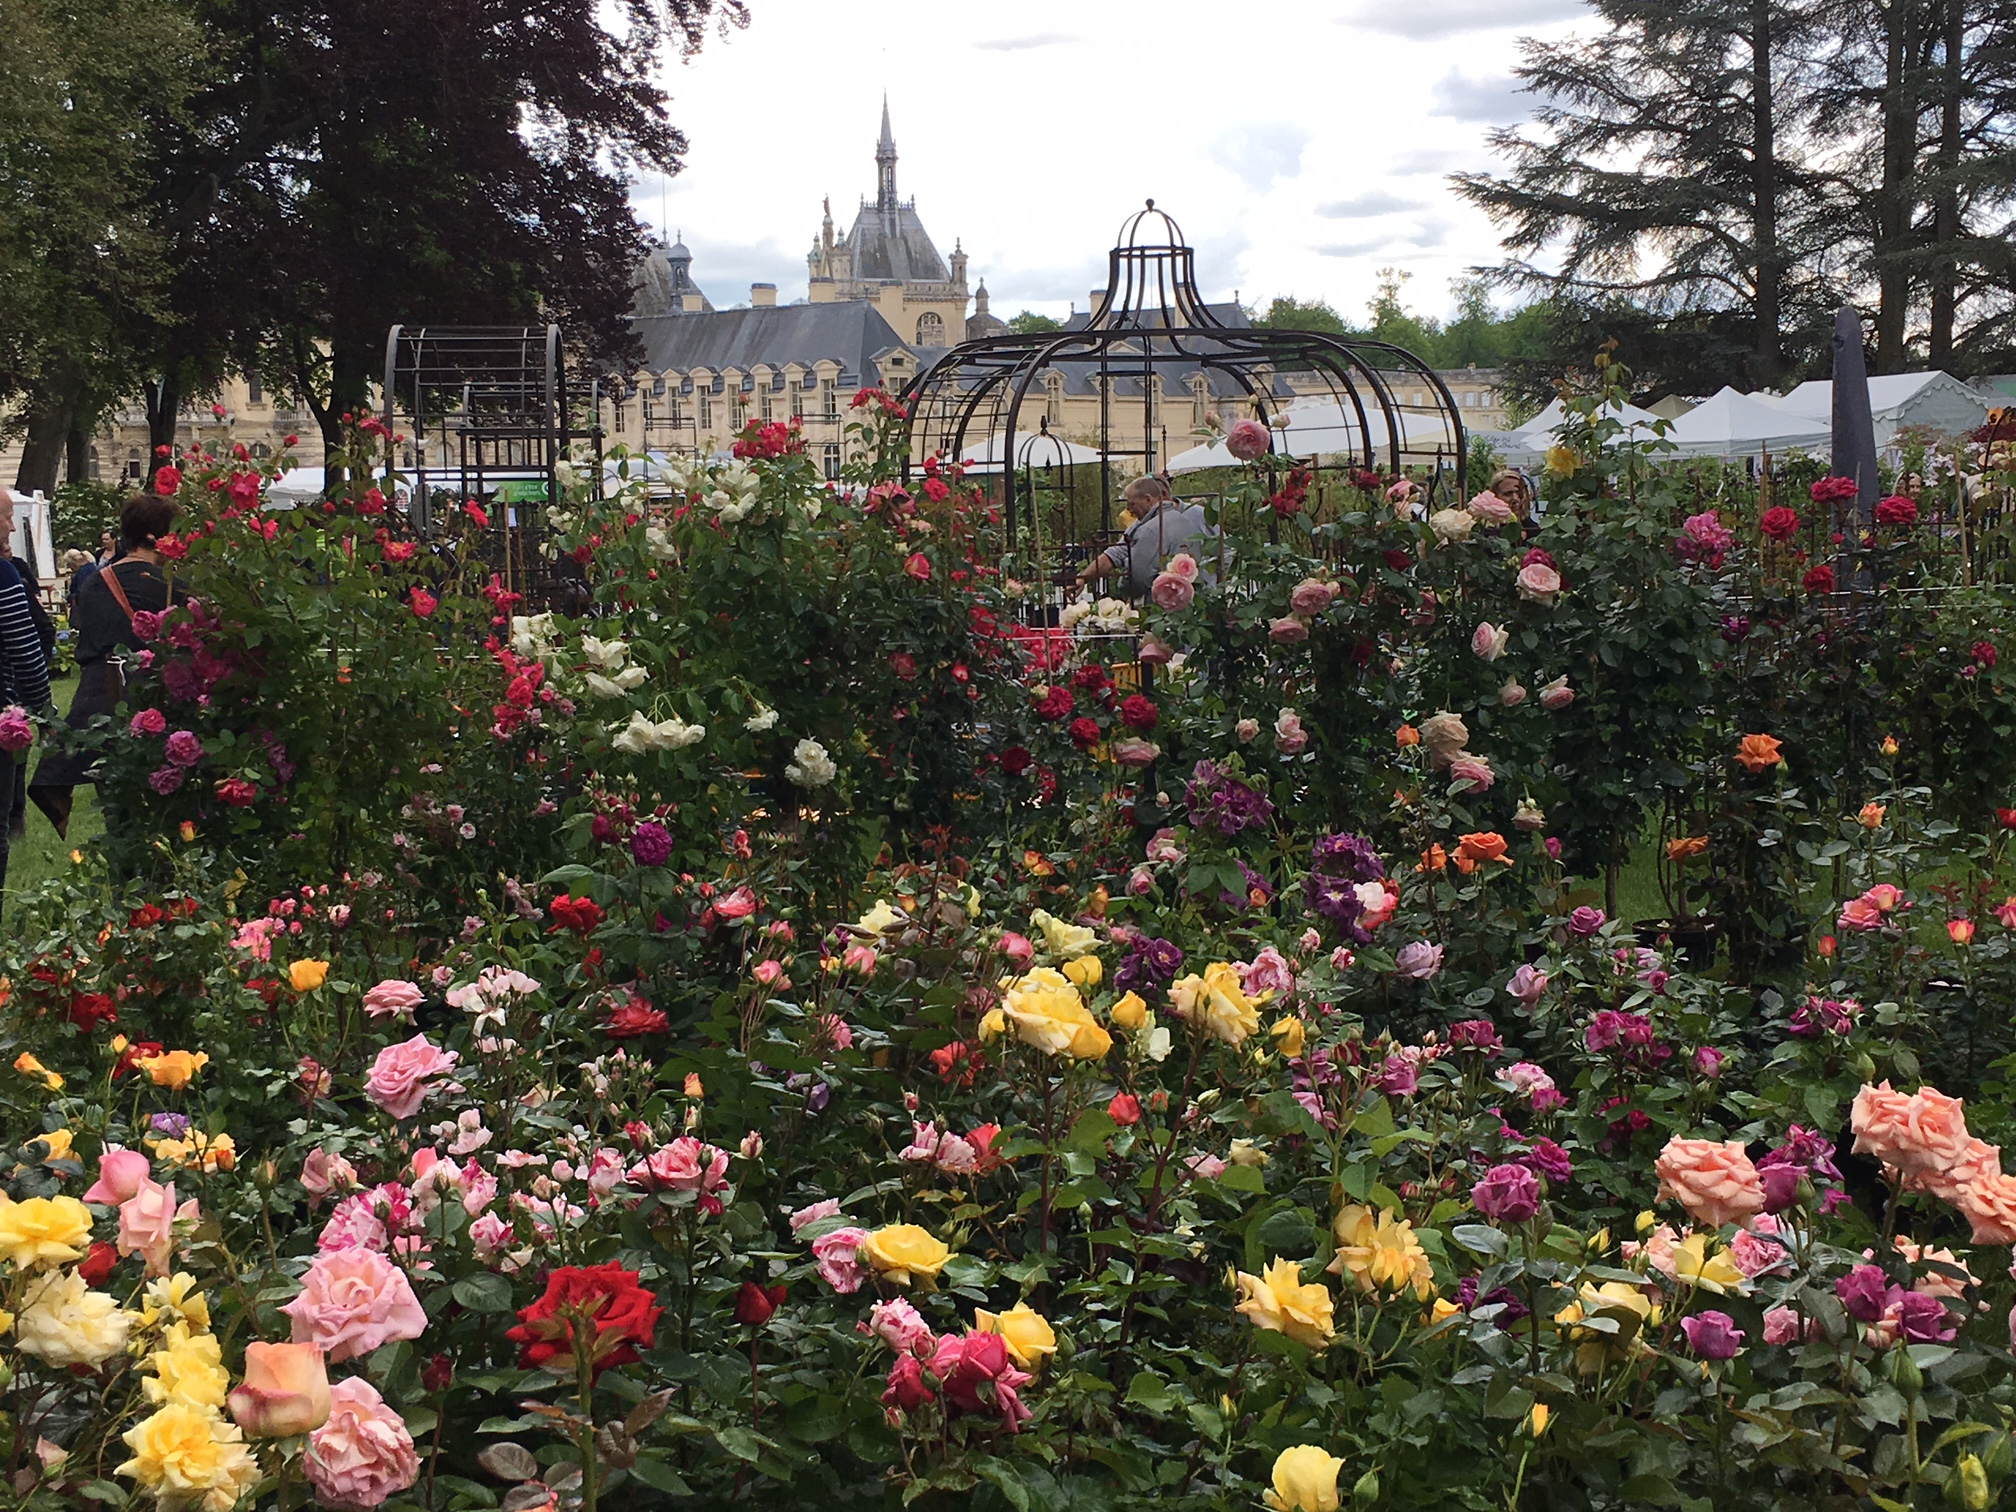 Chantilly the french chelsea les journ es des plantes heritage touring - Journee des plantes chantilly ...